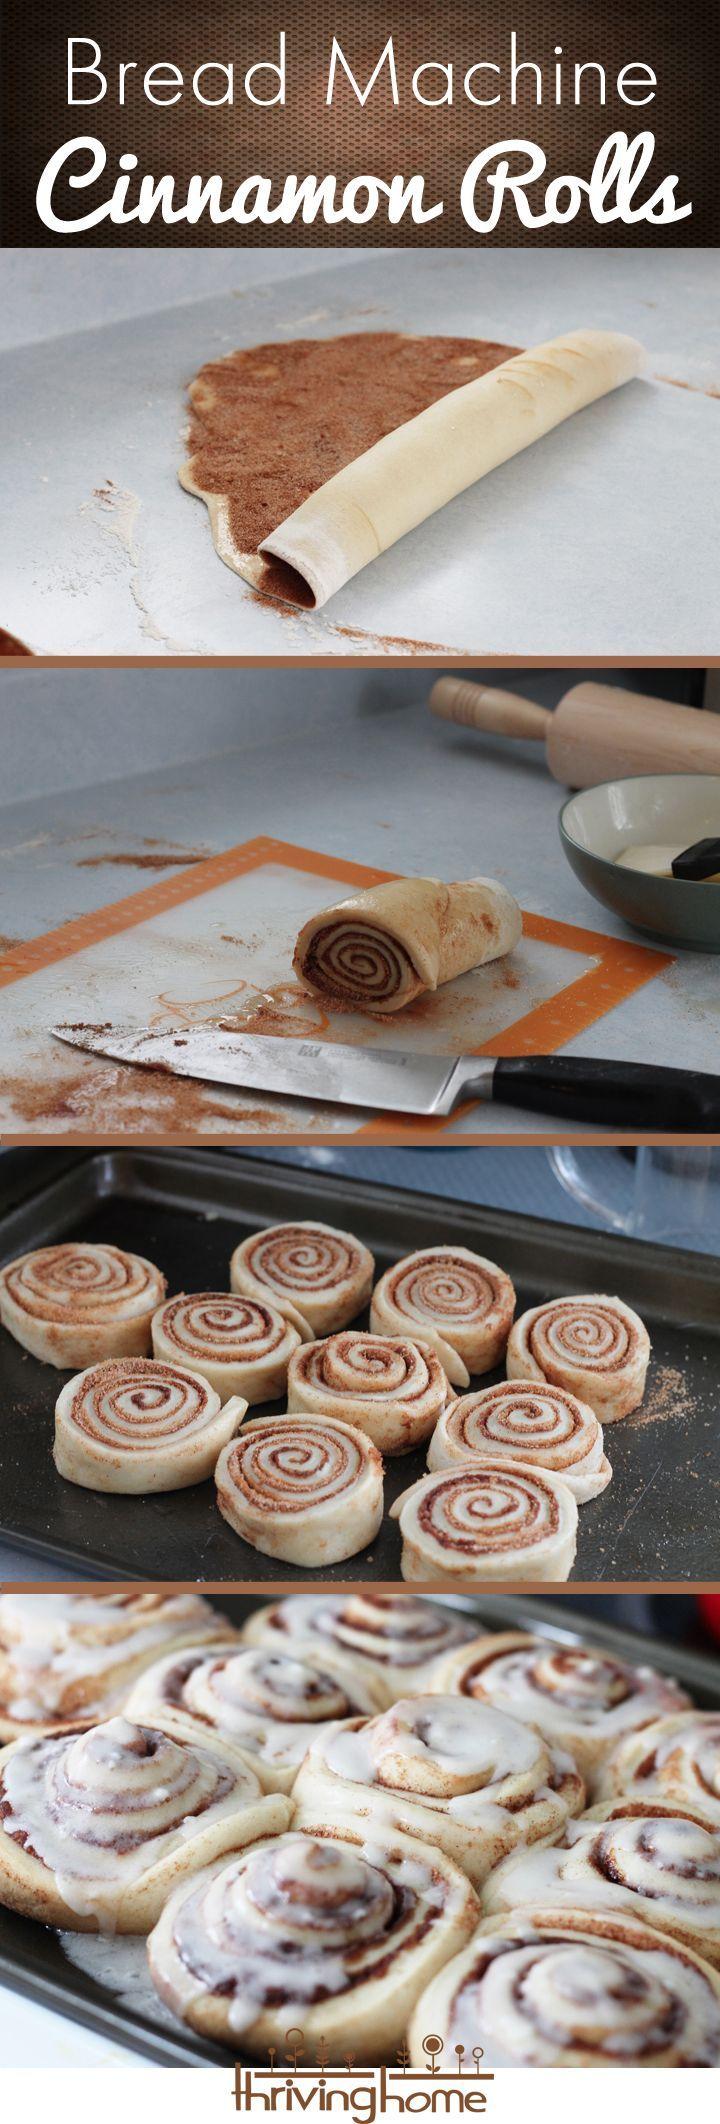 Bread Machine Cinnamon Roll Recipe. These are a game-changer!